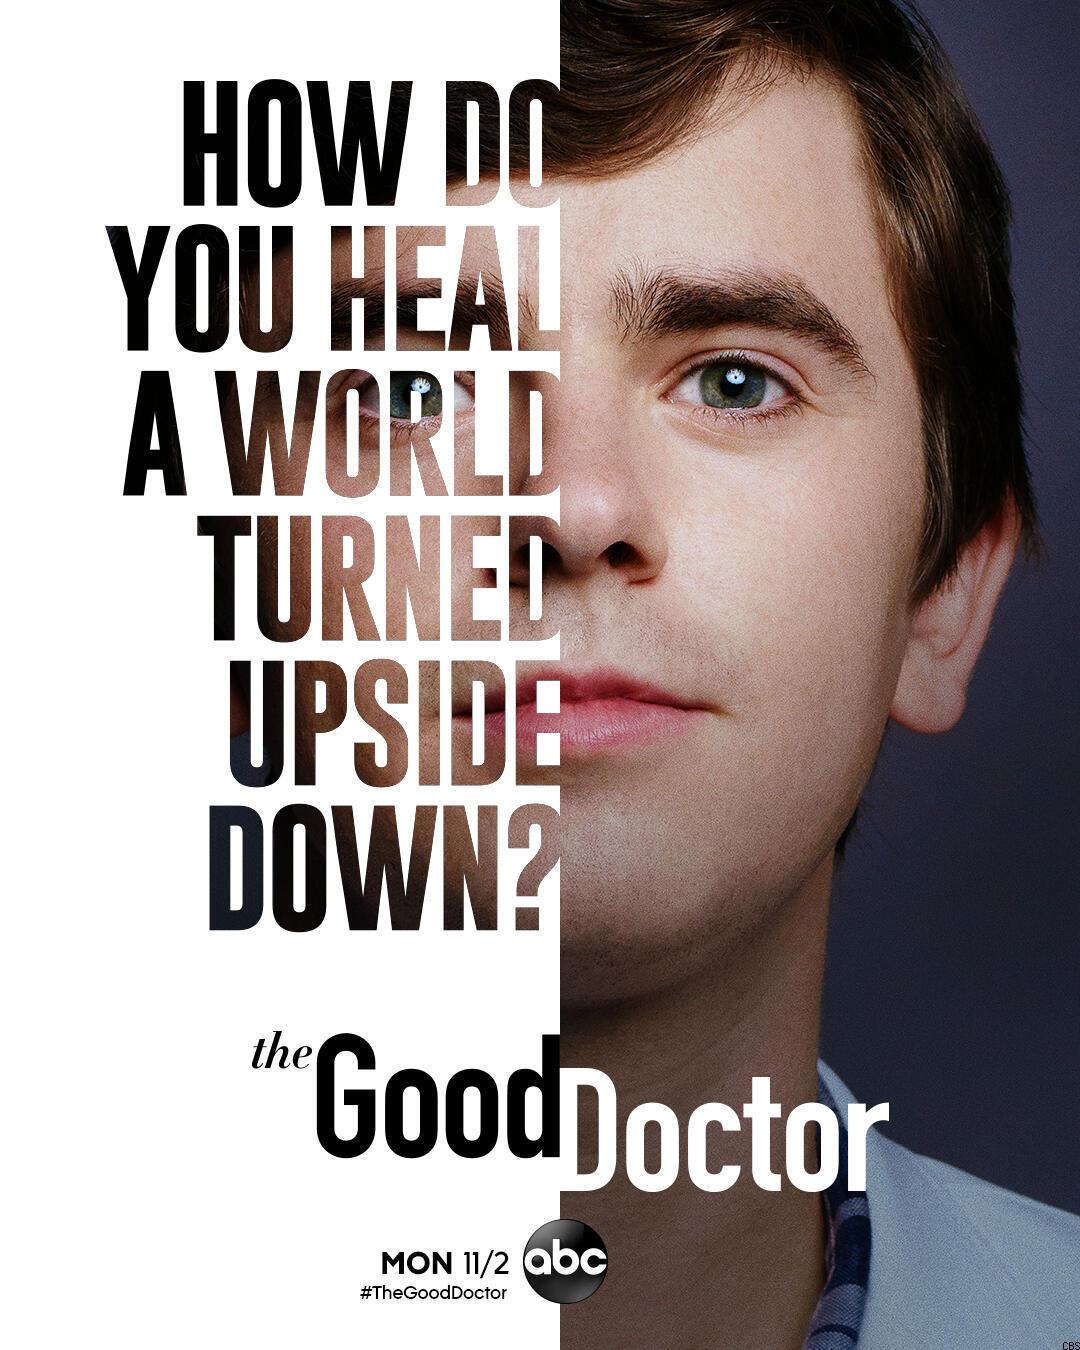 The Good Doctor Staffel 4 Start & Poster